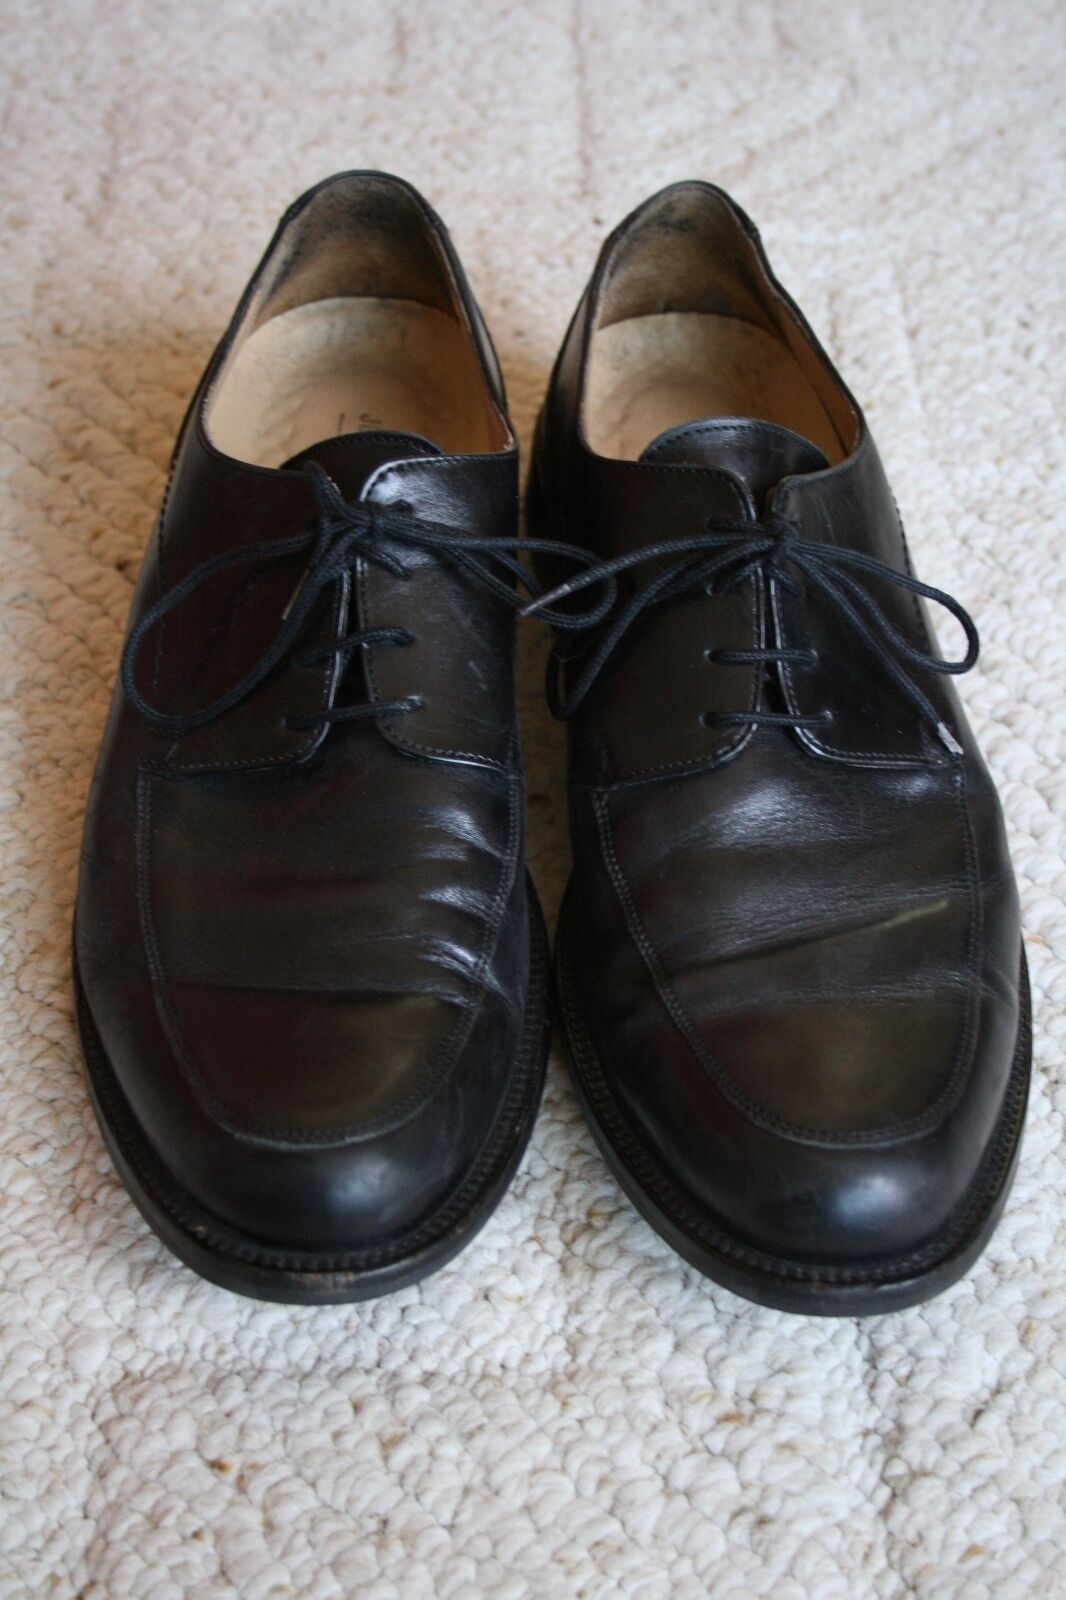 Johnston Murphy Negro Signature Series Moc & Toe Oxford Zapatos para hombre 10 M